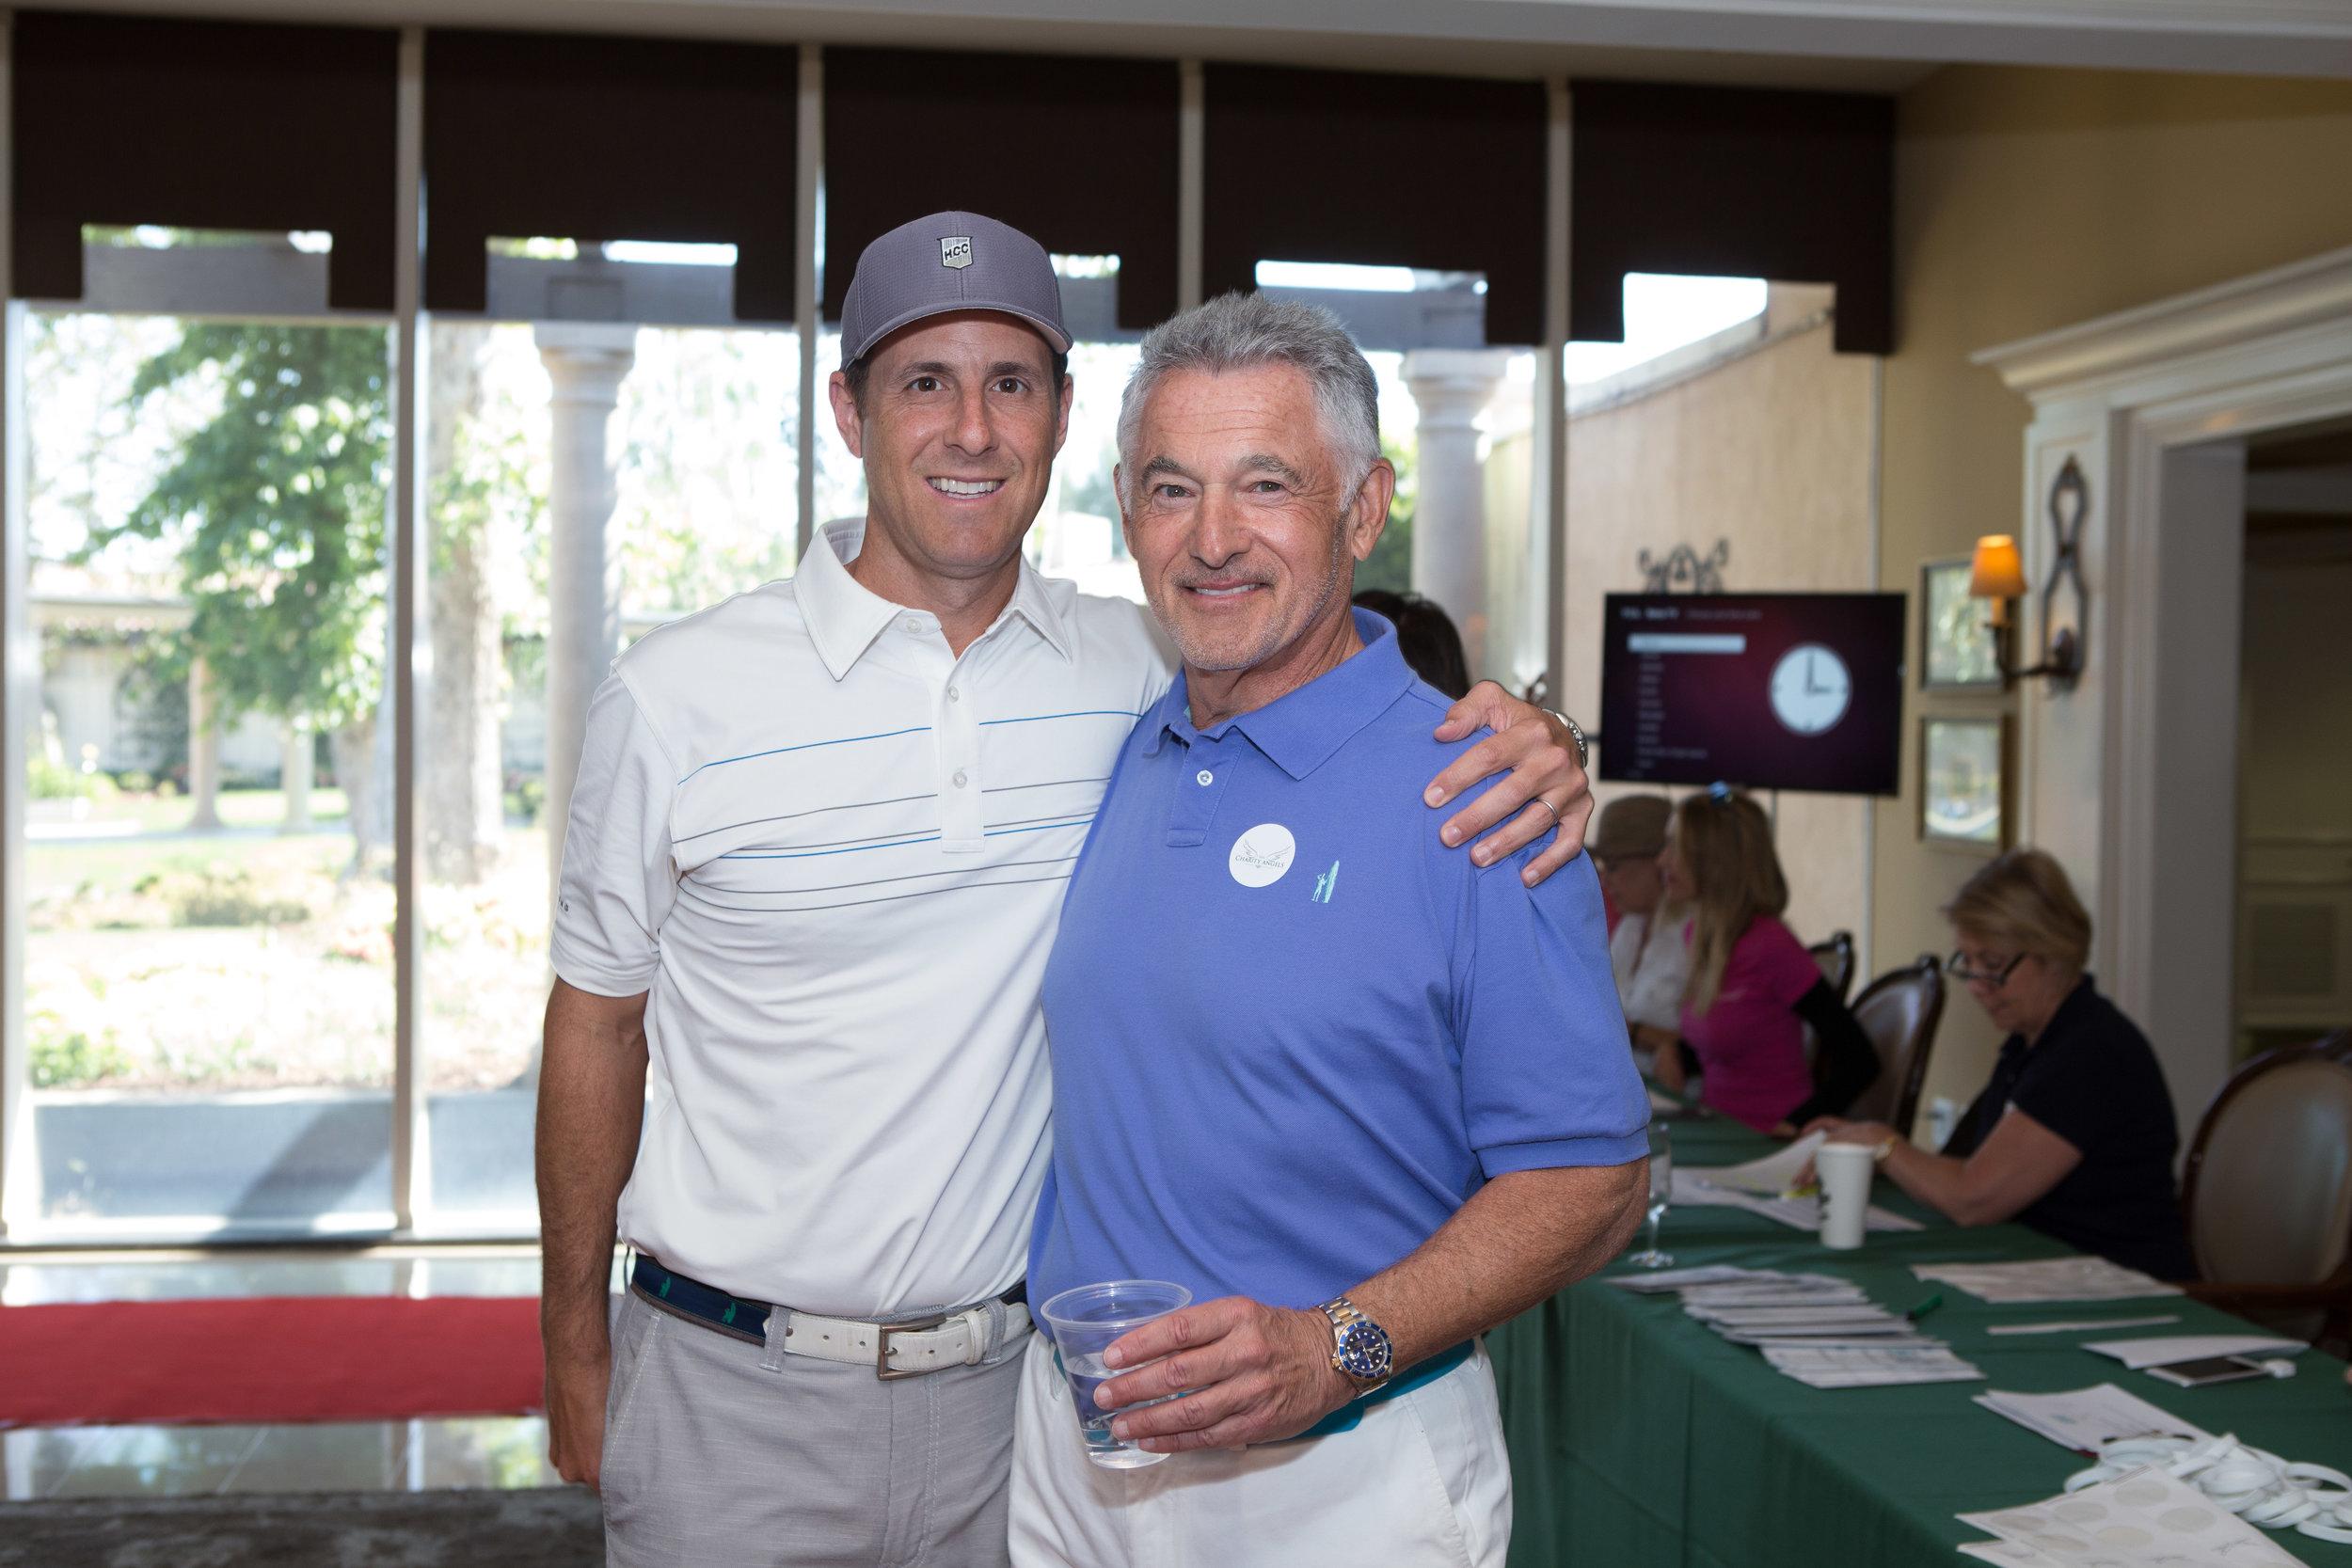 IMG_7737-Ron & Golfer.jpg